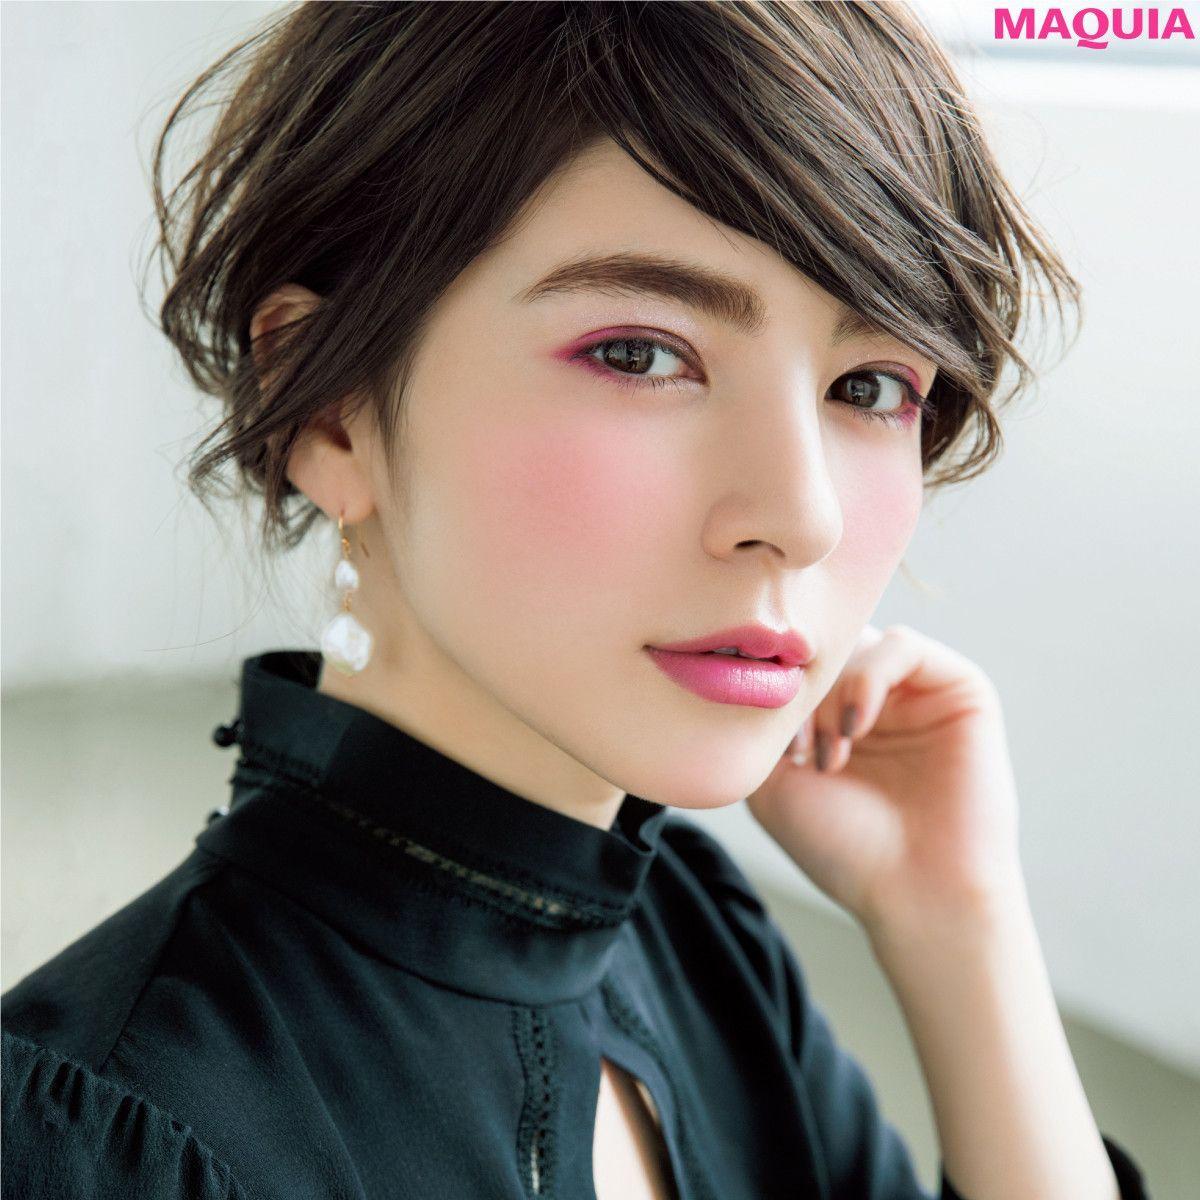 「MAQUIA」9月号では、人気アーティストの千吉良さんのお